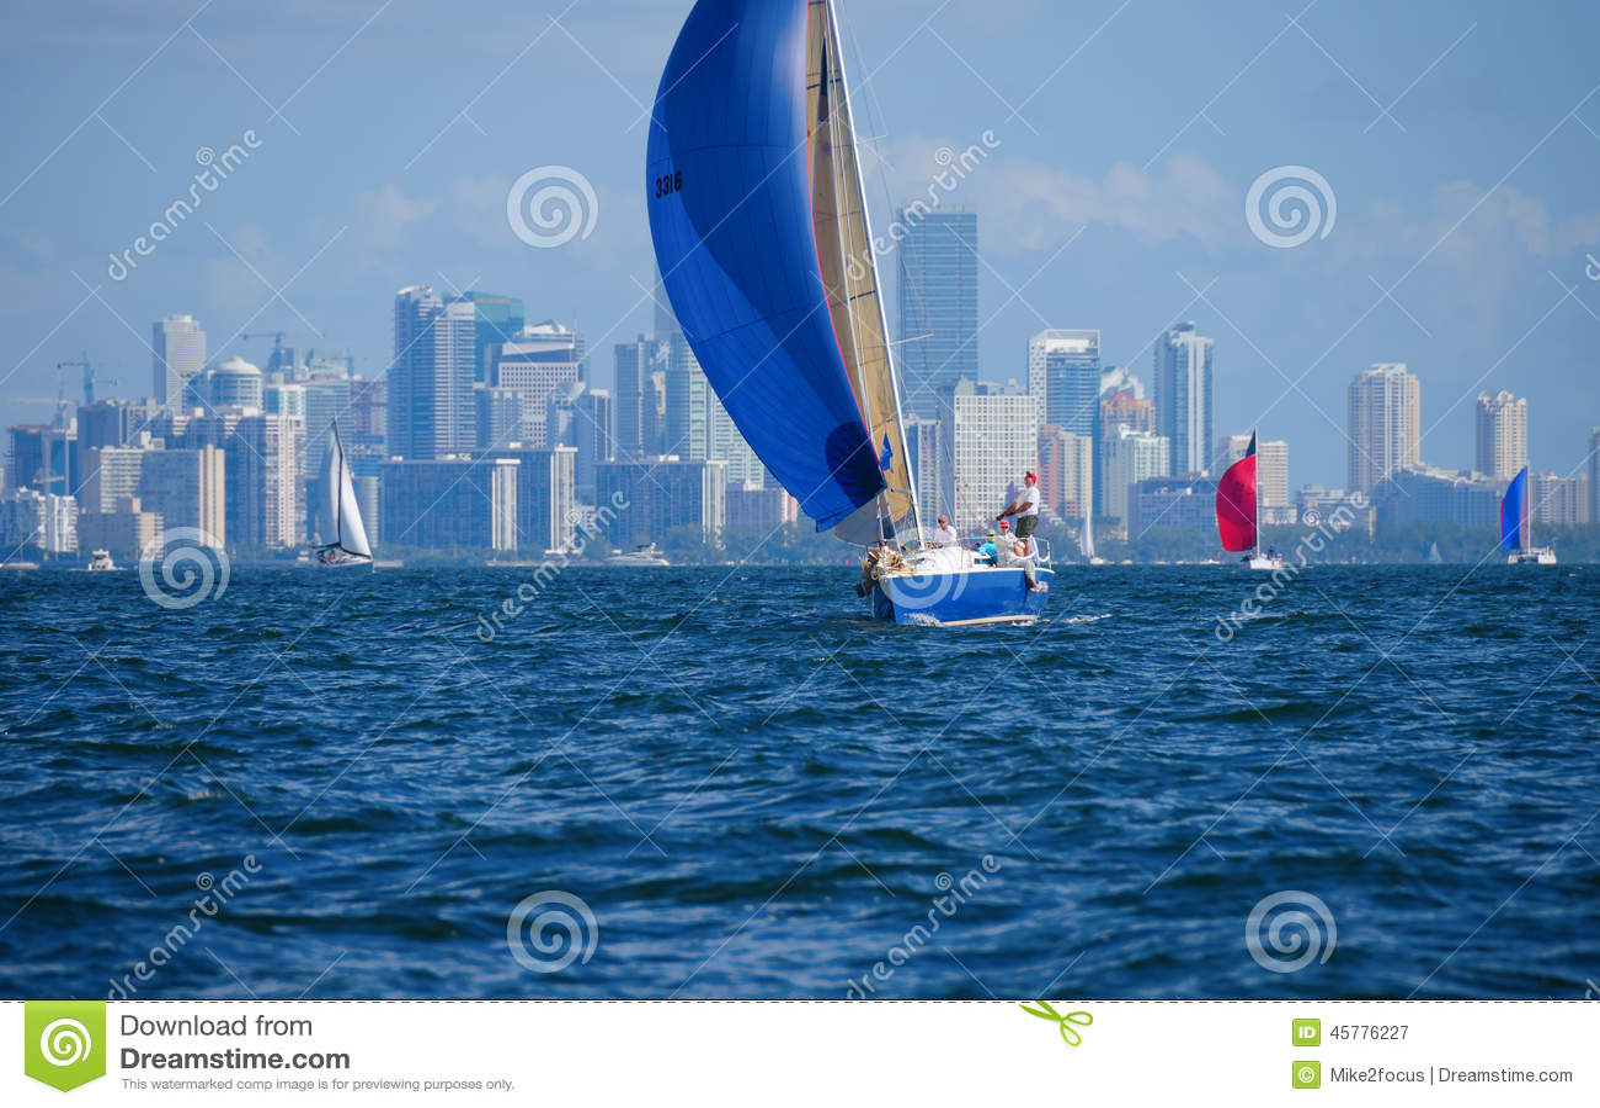 Sailing Regatta Sailboat Race W Miami Florida Skyline